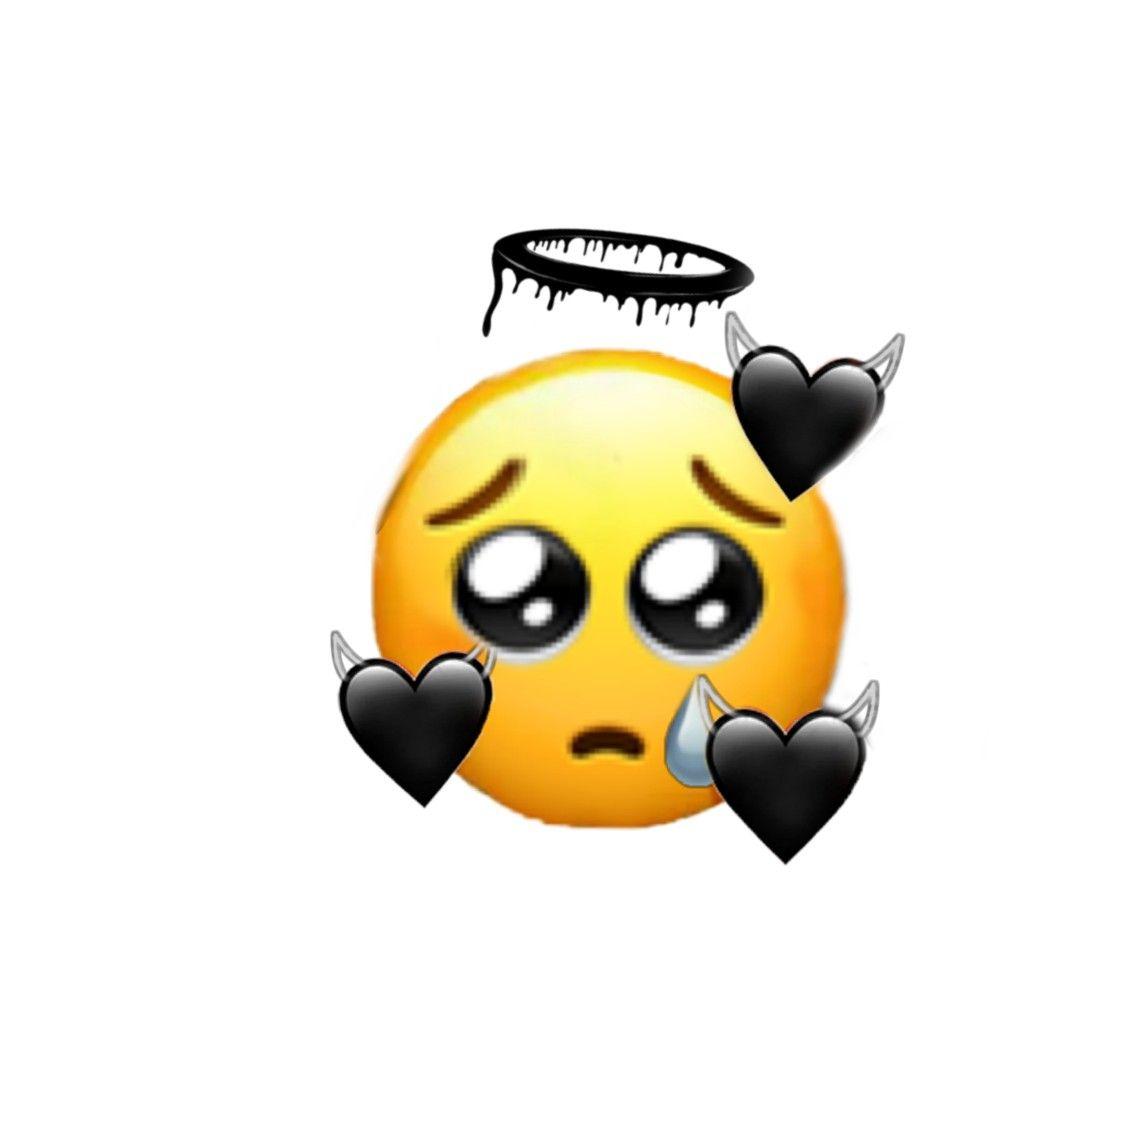 Bad Mood In 2021 Cute Emoji Wallpaper Emoji Wallpaper Cute Emoji